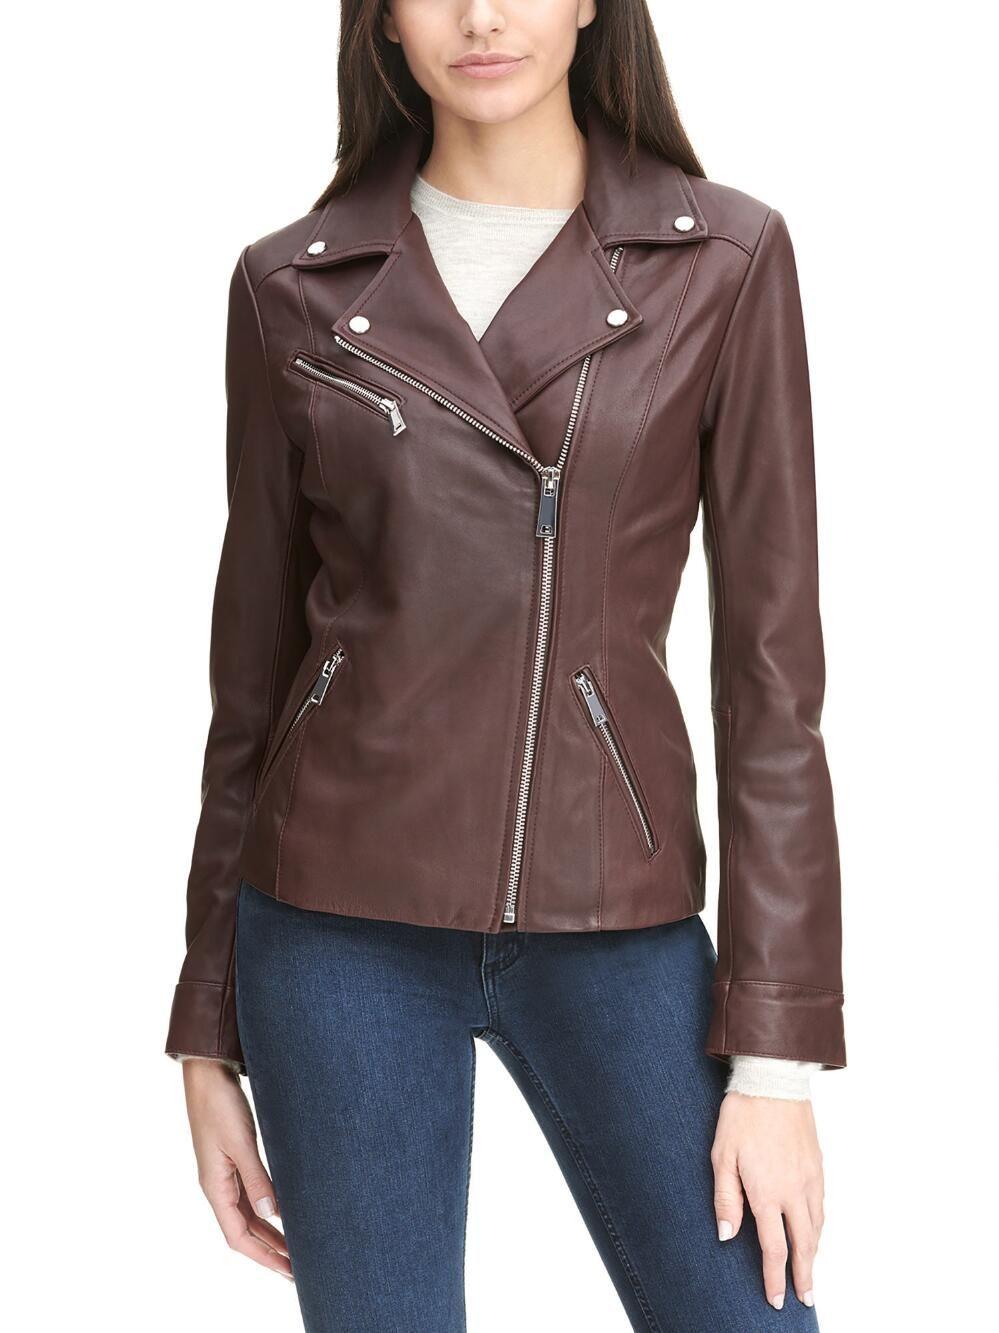 Monica Asymmetrical Leather Jacket Wilsons Leather Asymmetrical Leather Jacket Leather Jacket Zipped Leather Jacket [ 1333 x 999 Pixel ]